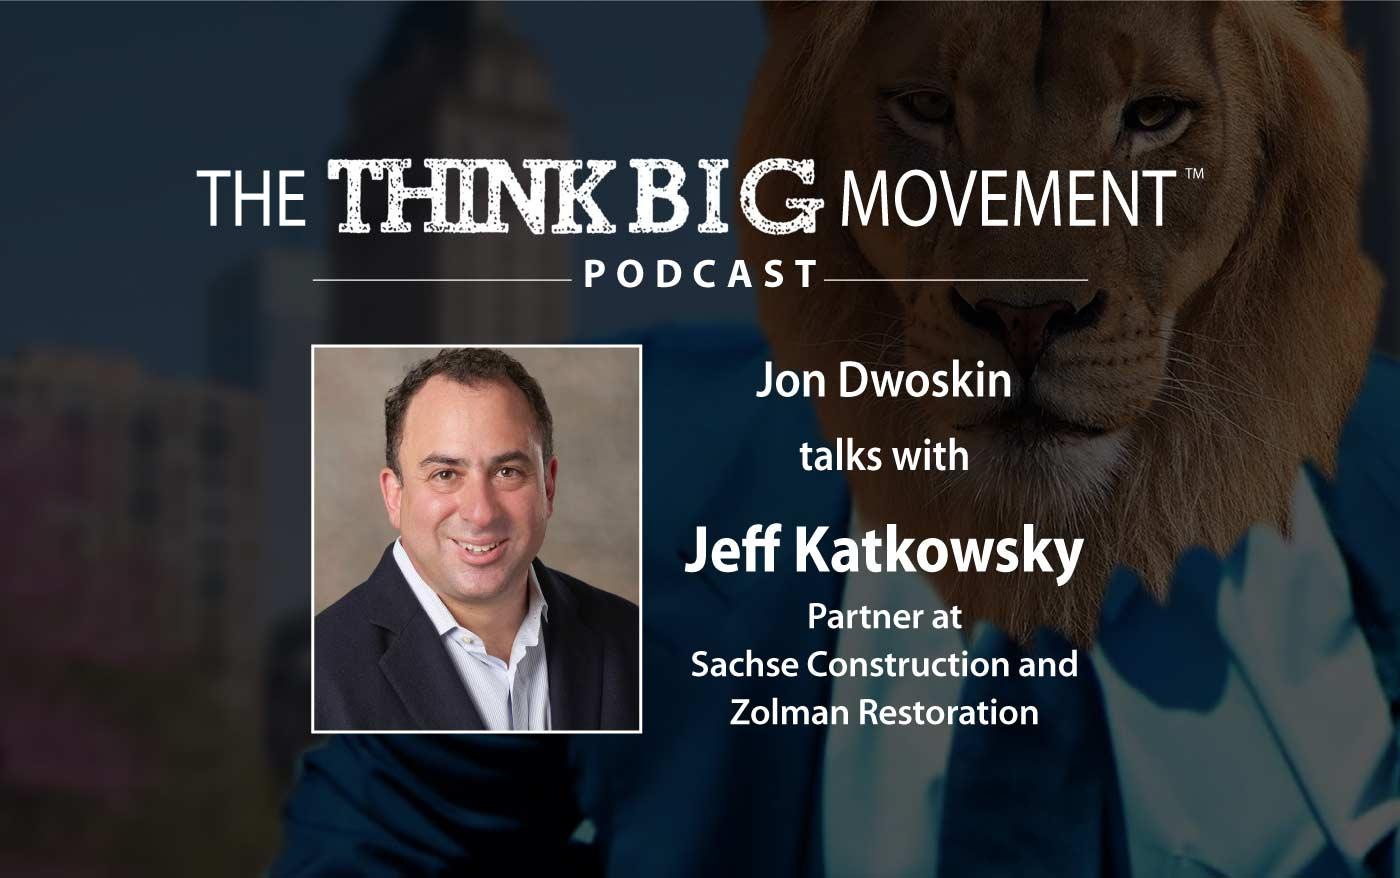 Jon Dwoskin Interviews Jeff Katkowsky - Partner at Sachse Construction and Zolman Restoration